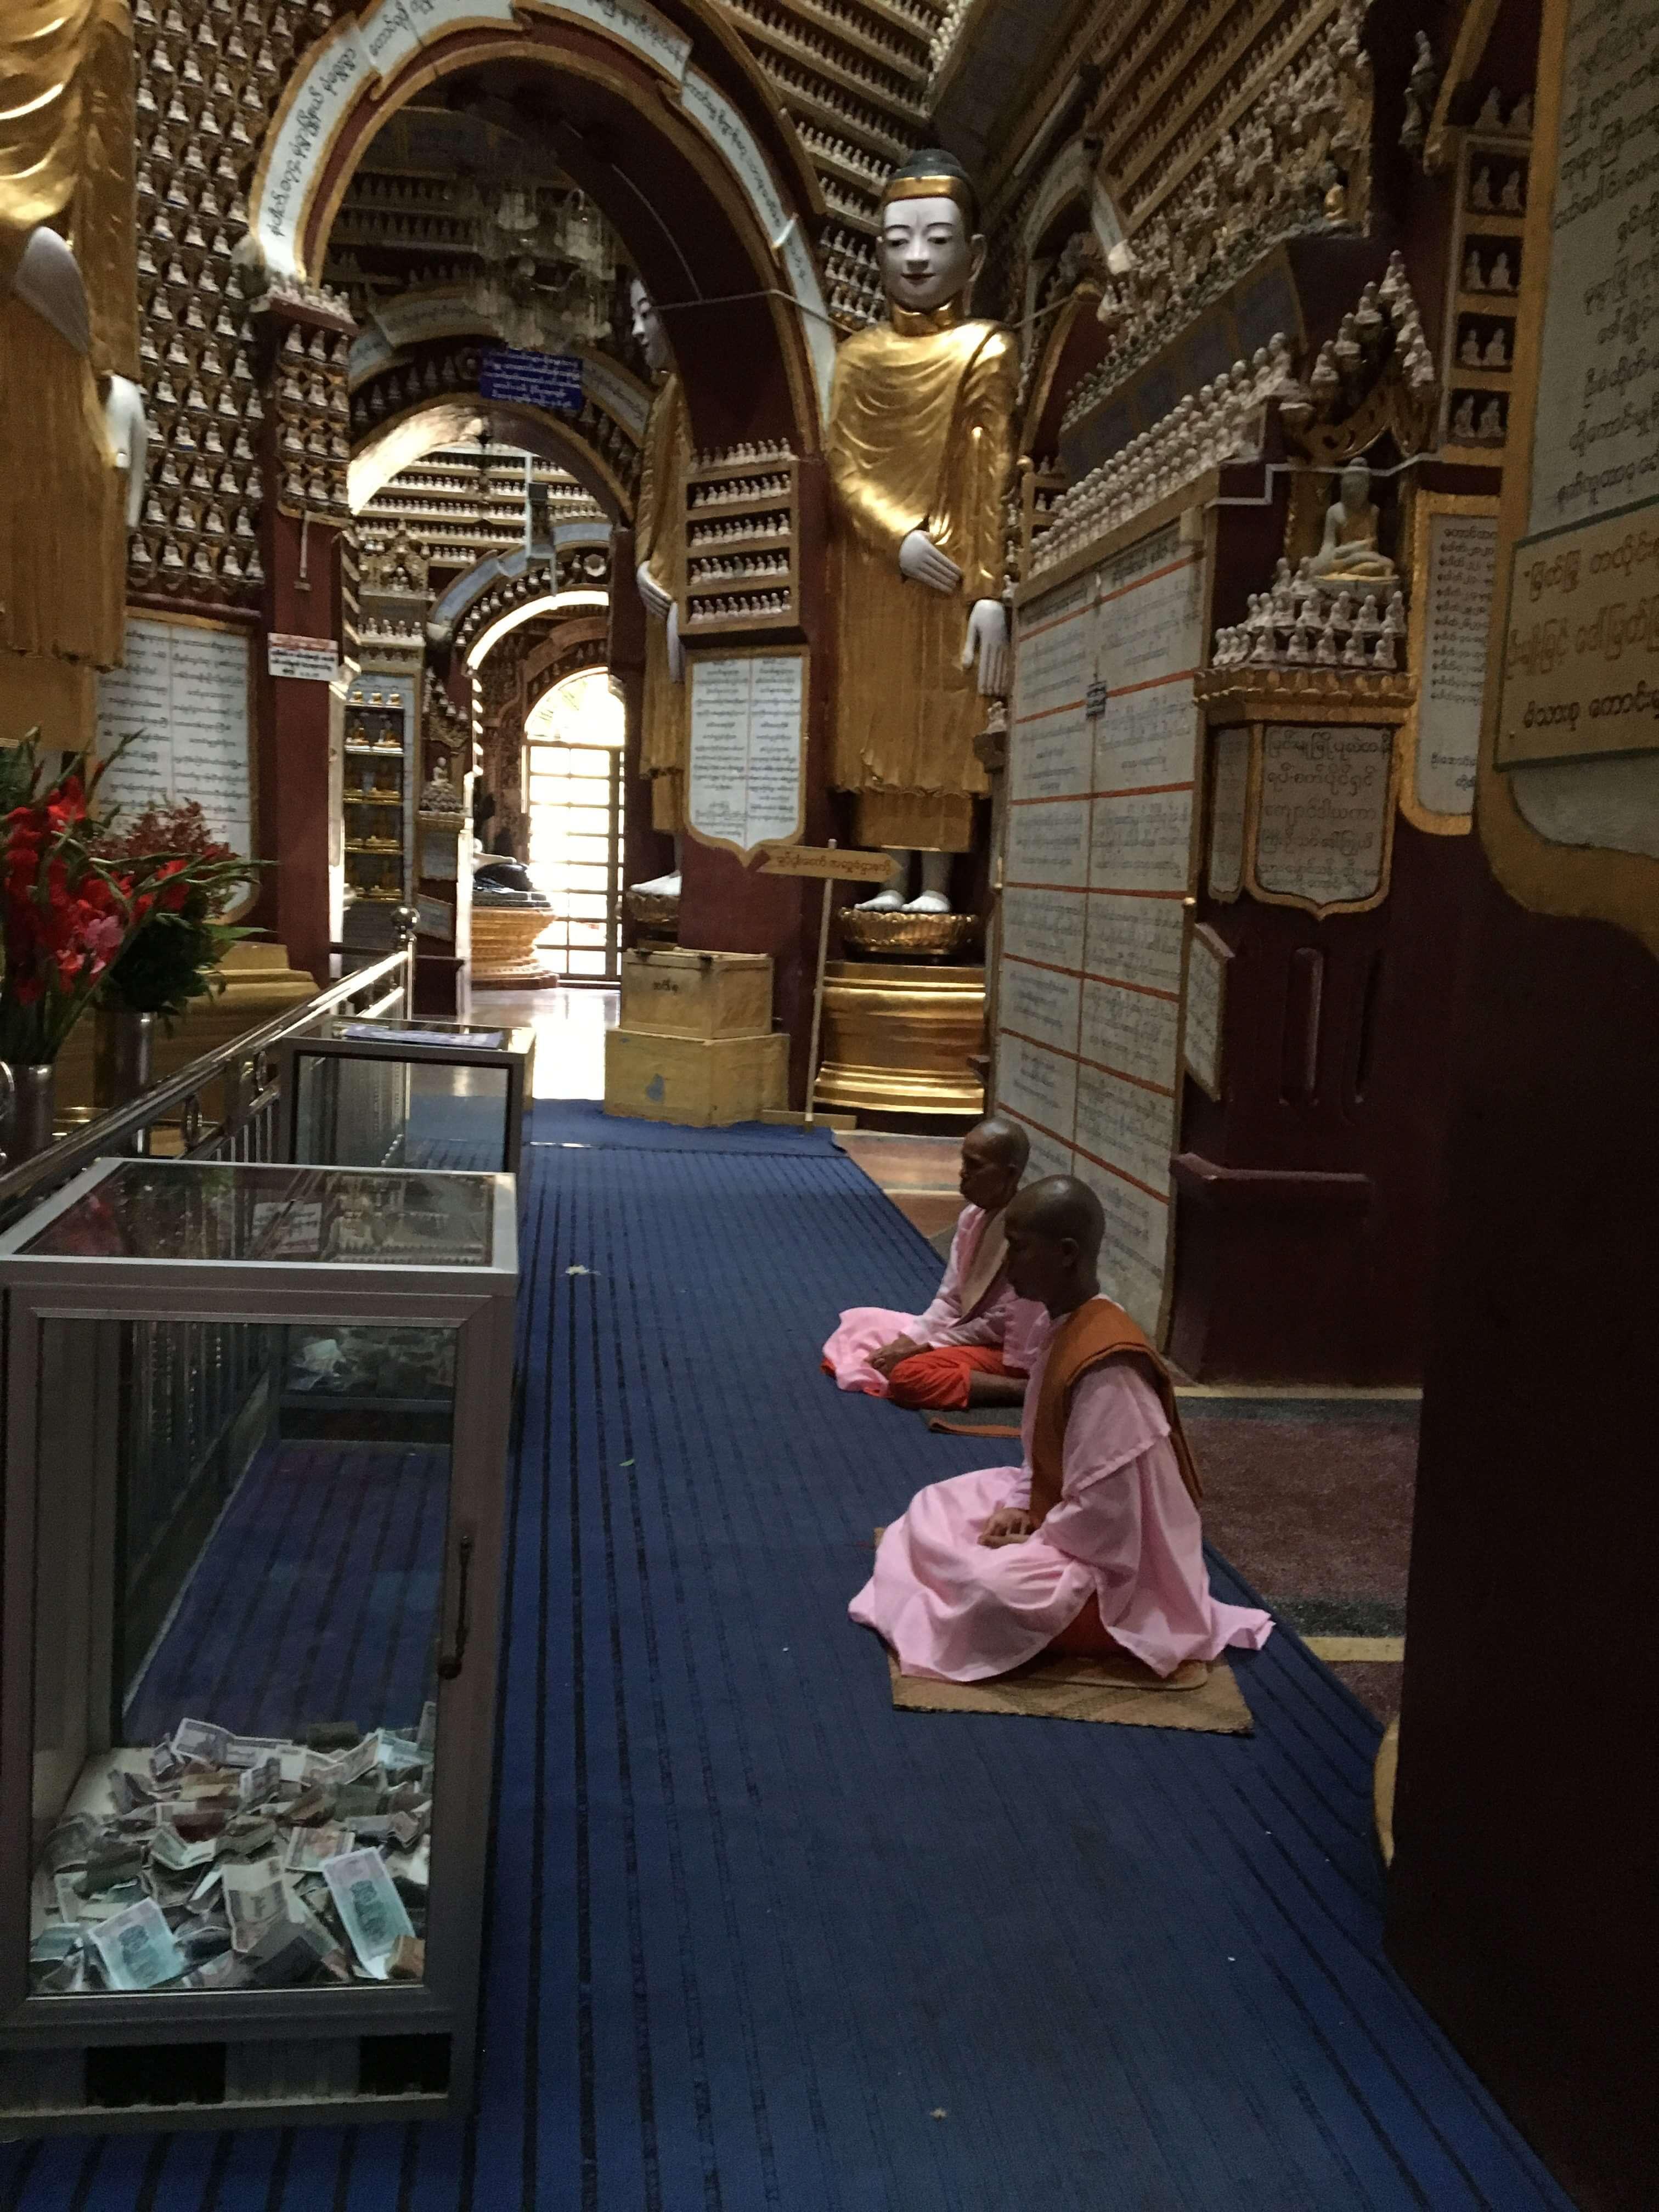 Thanboddhay Pagoda, Burma